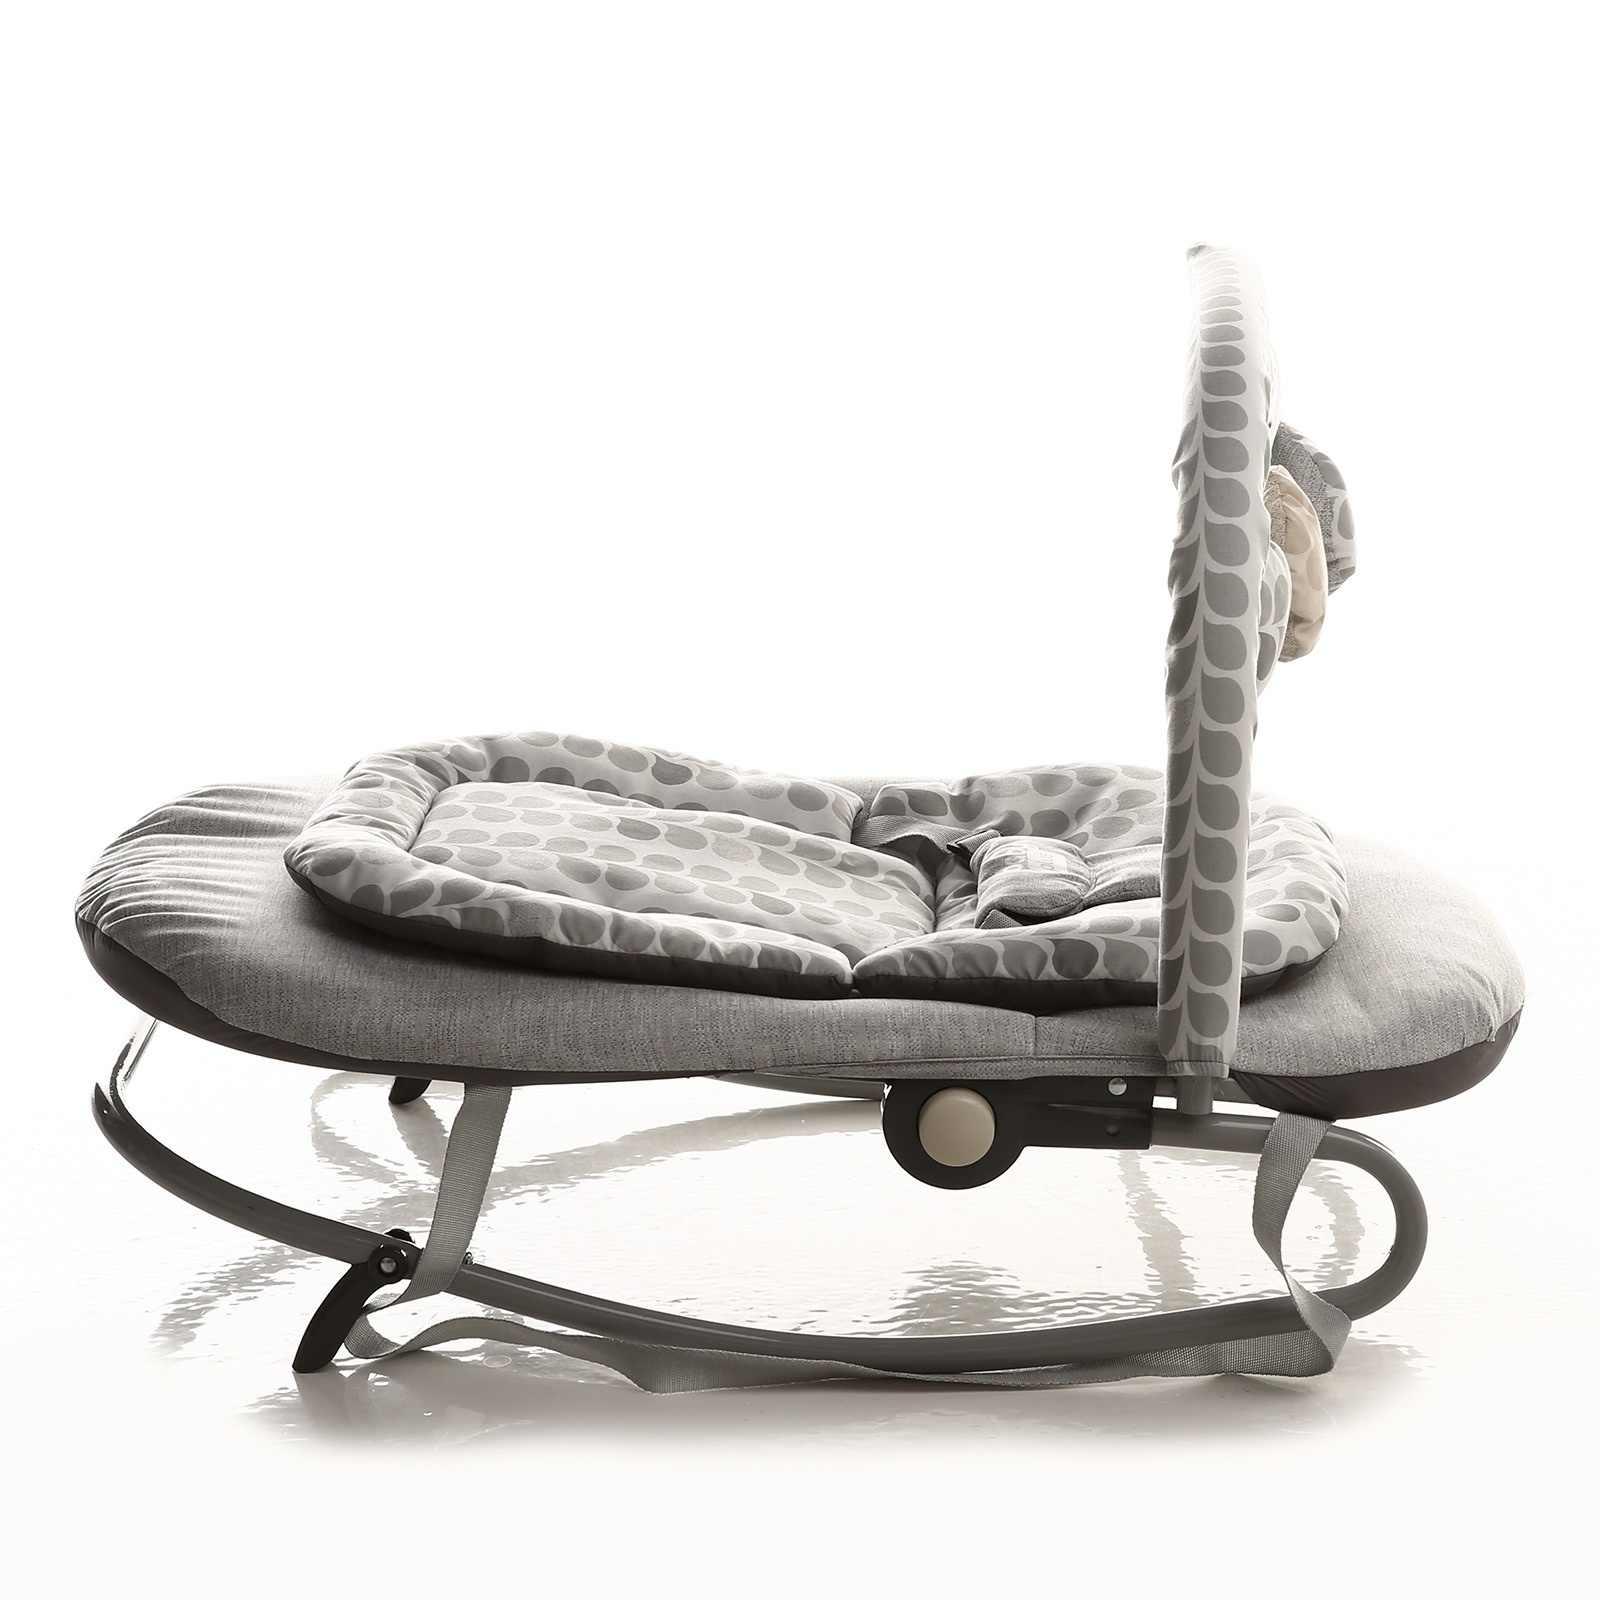 Ebebek เด็ก & PLUS Lounge Baby Bouncer เก้าอี้ของเล่น